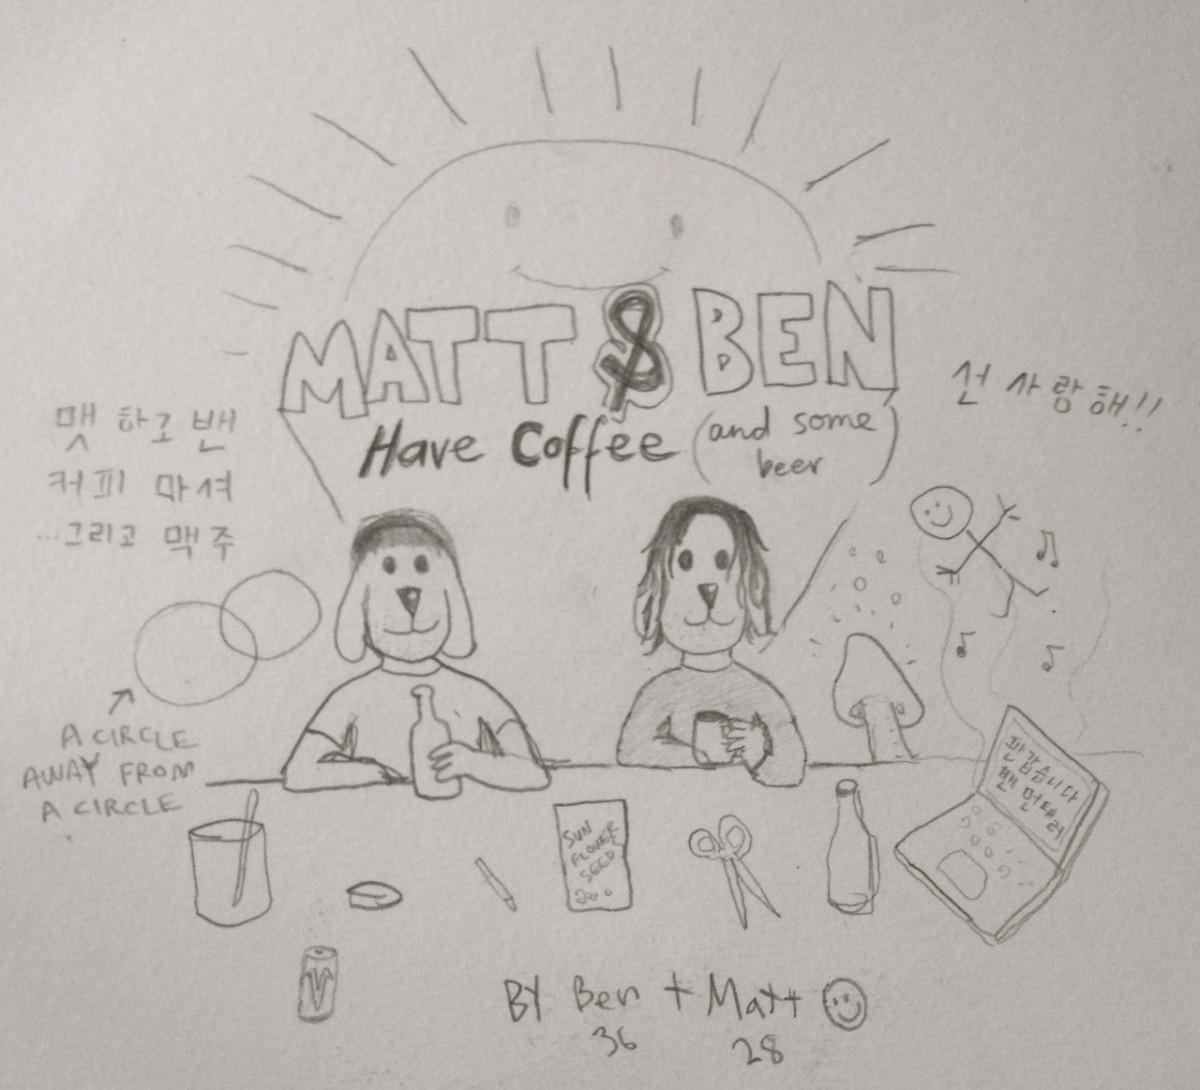 matt and ben on coffee date